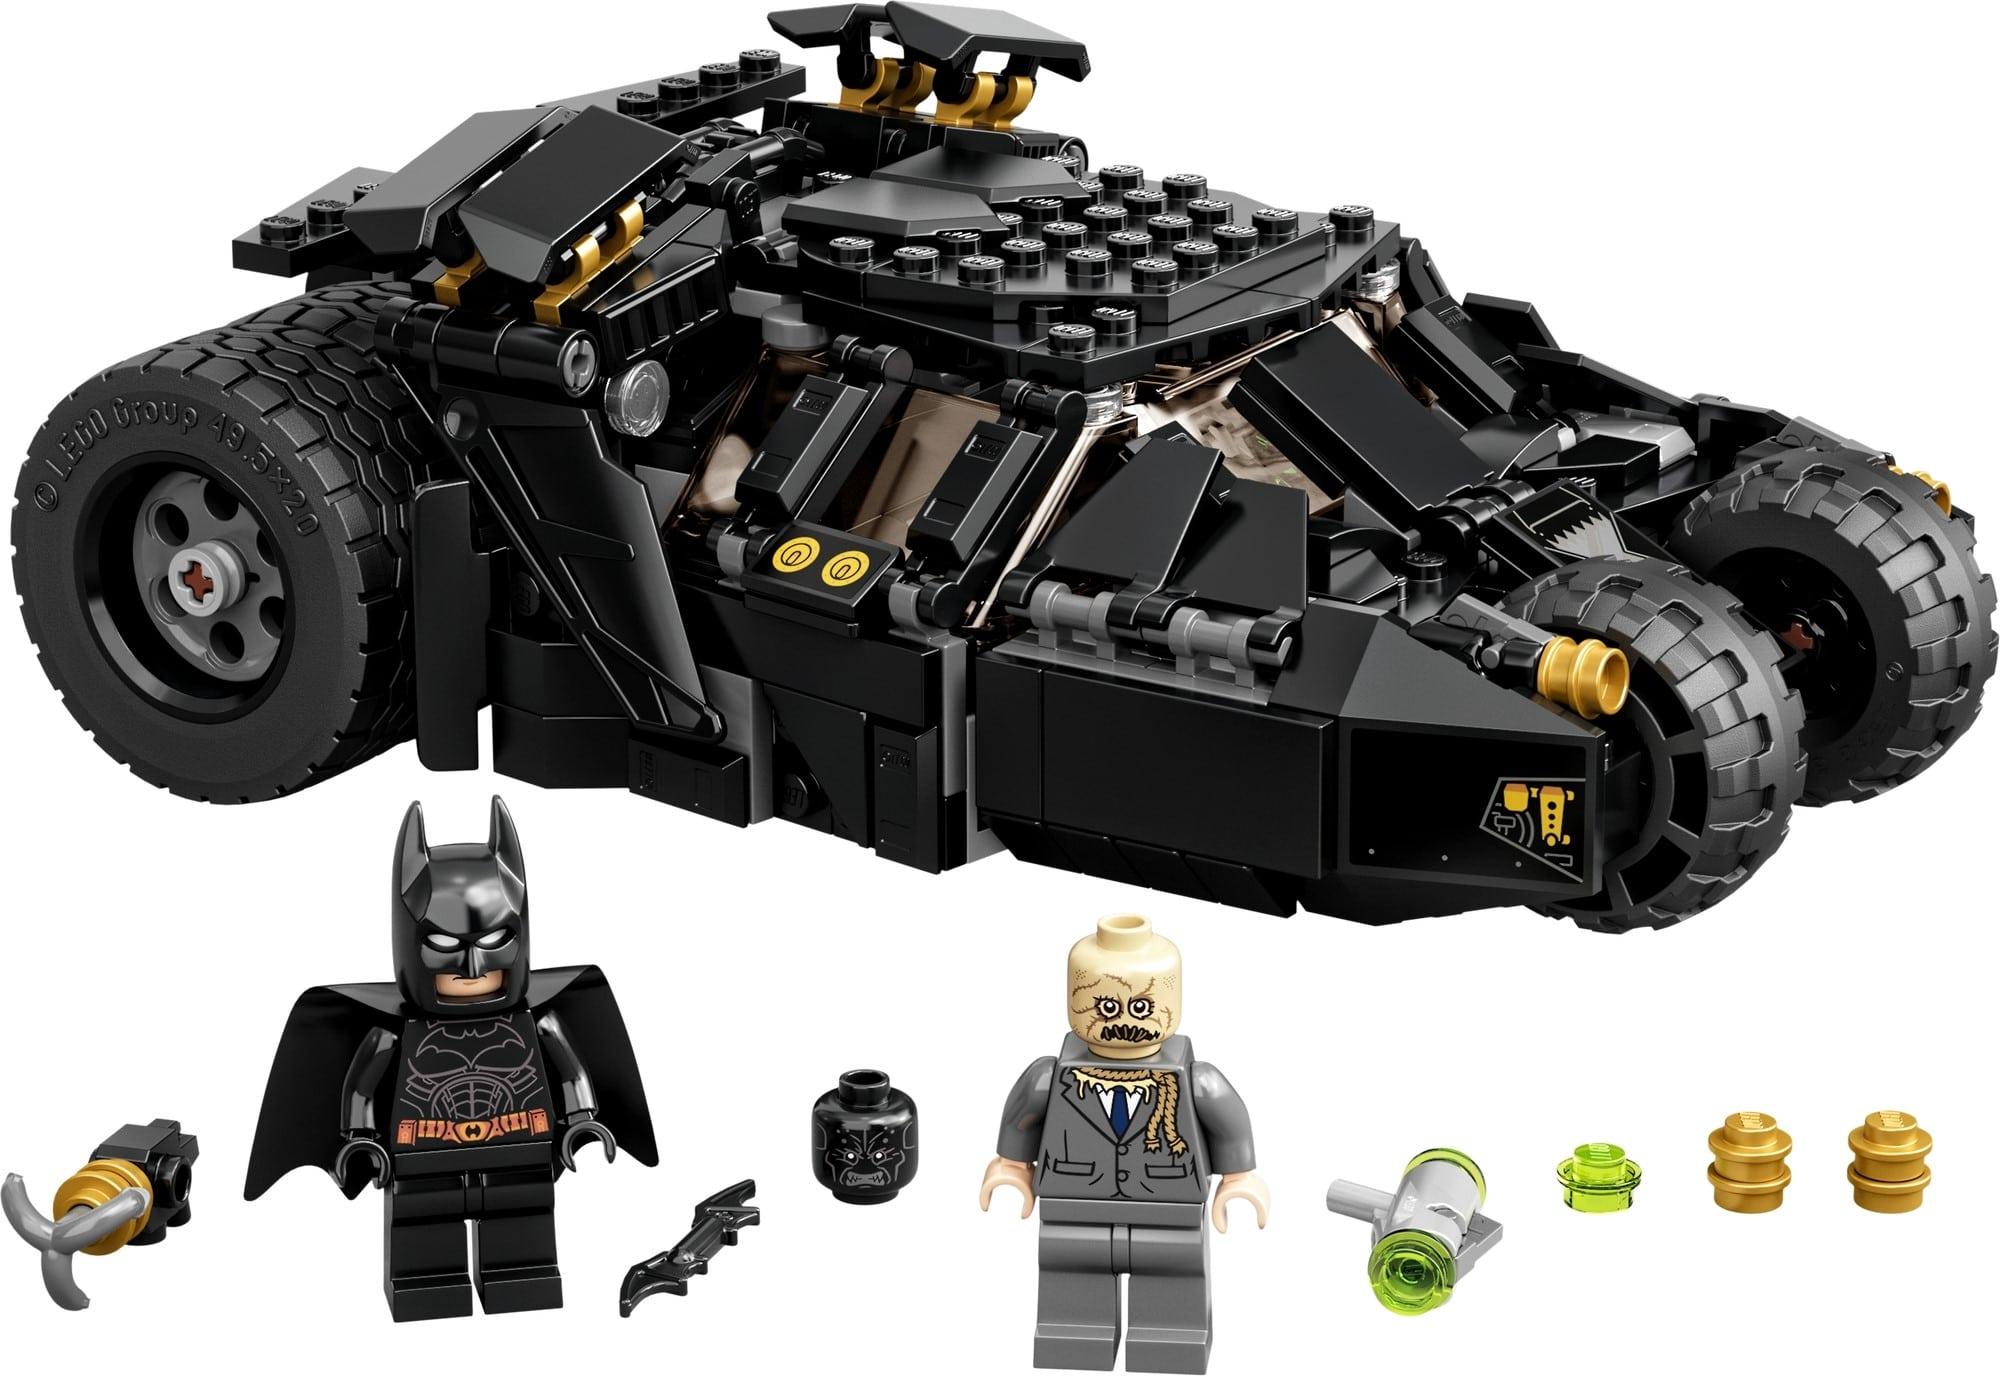 LEGO Dc 76239 LEGO Dc Batman Batmobile Tumbler Duell Mit Scarecrow 1